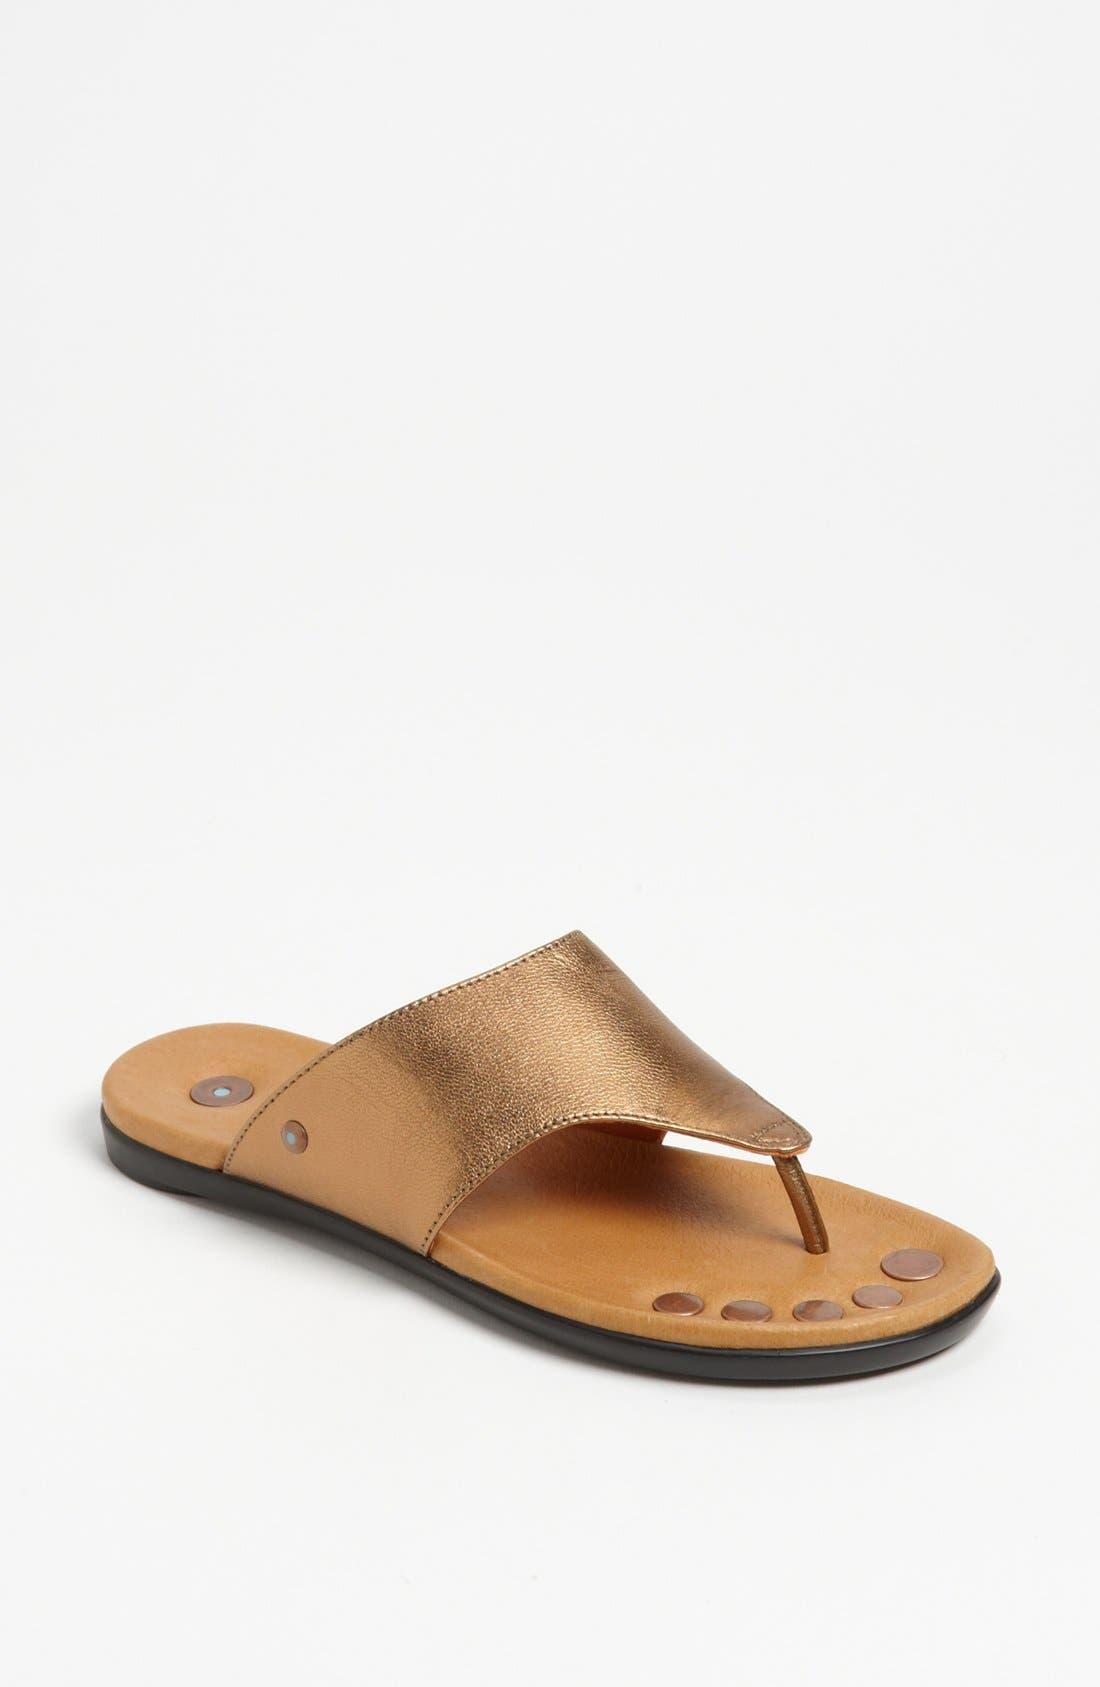 Alternate Image 1 Selected - Juil 'Brio' Sandal